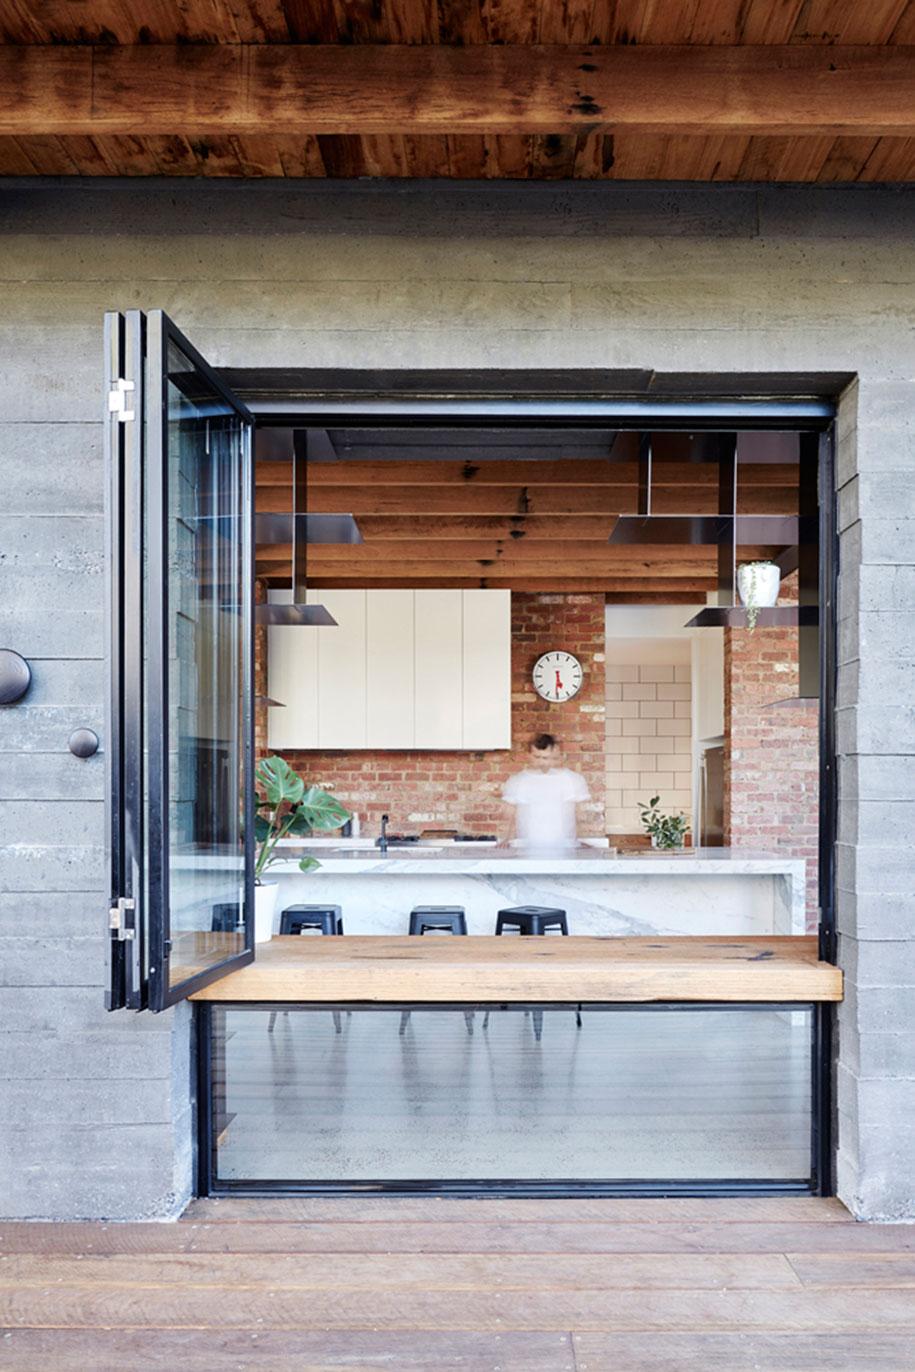 Plan To Build window